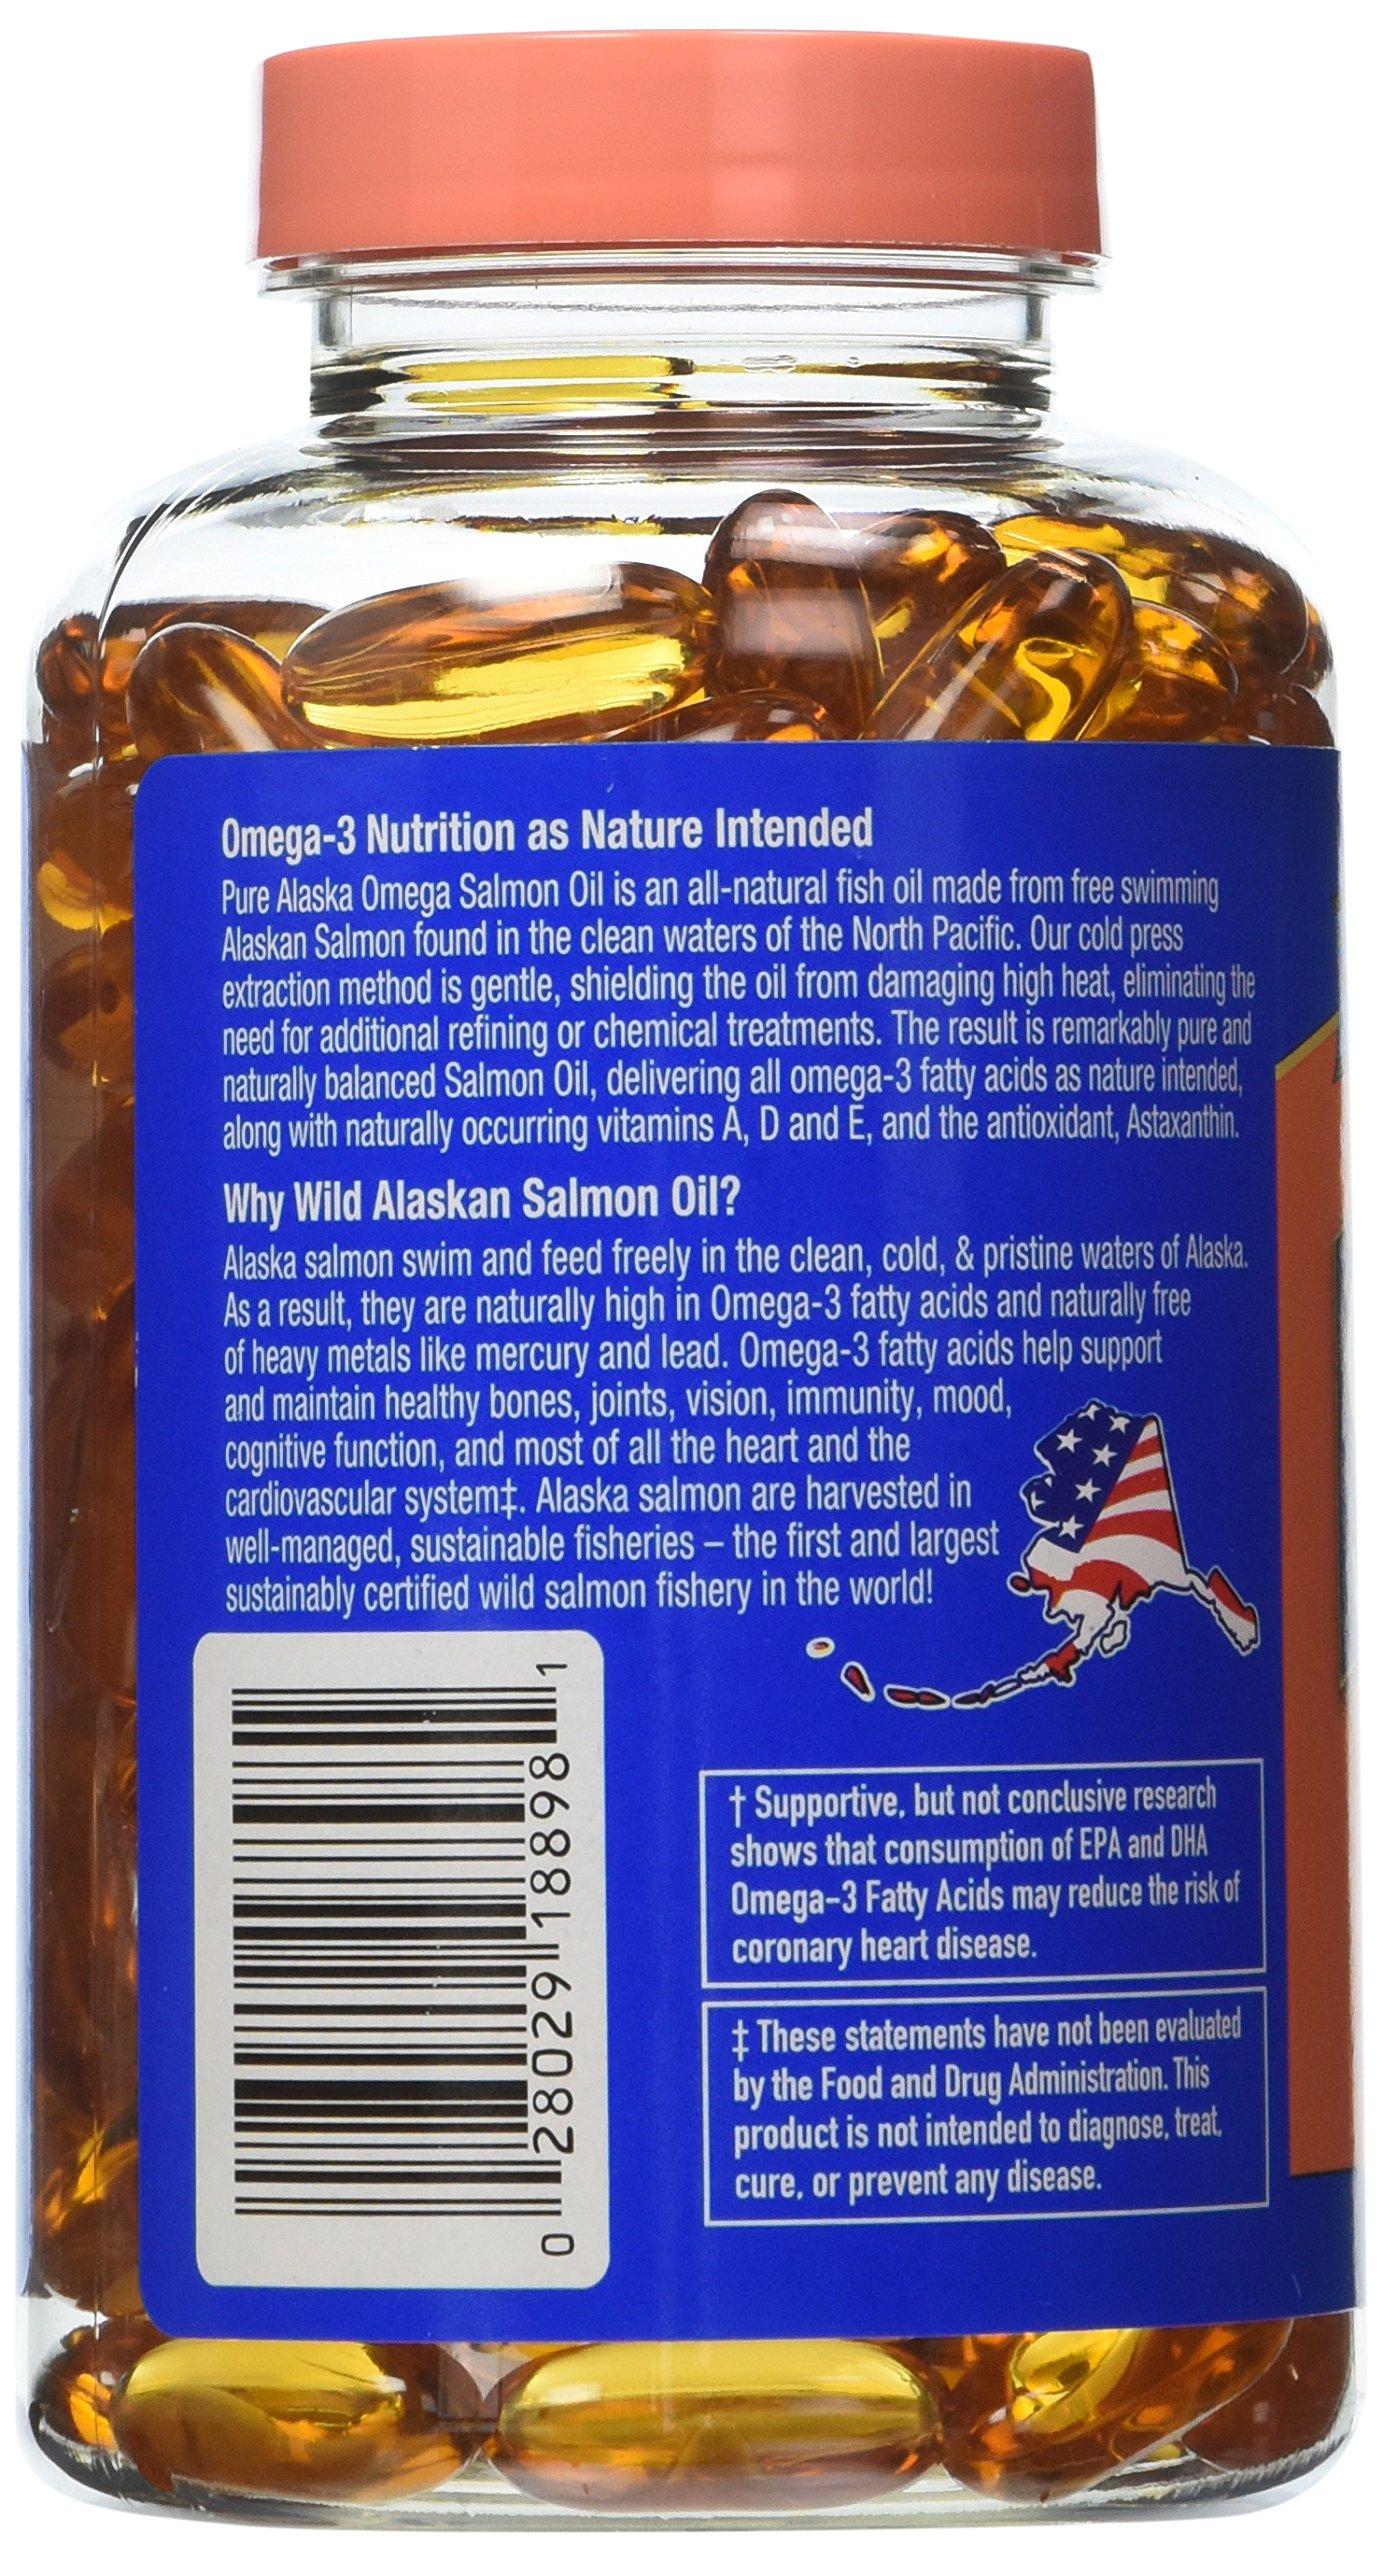 Pure Alaska Omega Wild Alaskan Salmon Oil 1000 mg - 2 Bottles, 180 Softgels Each